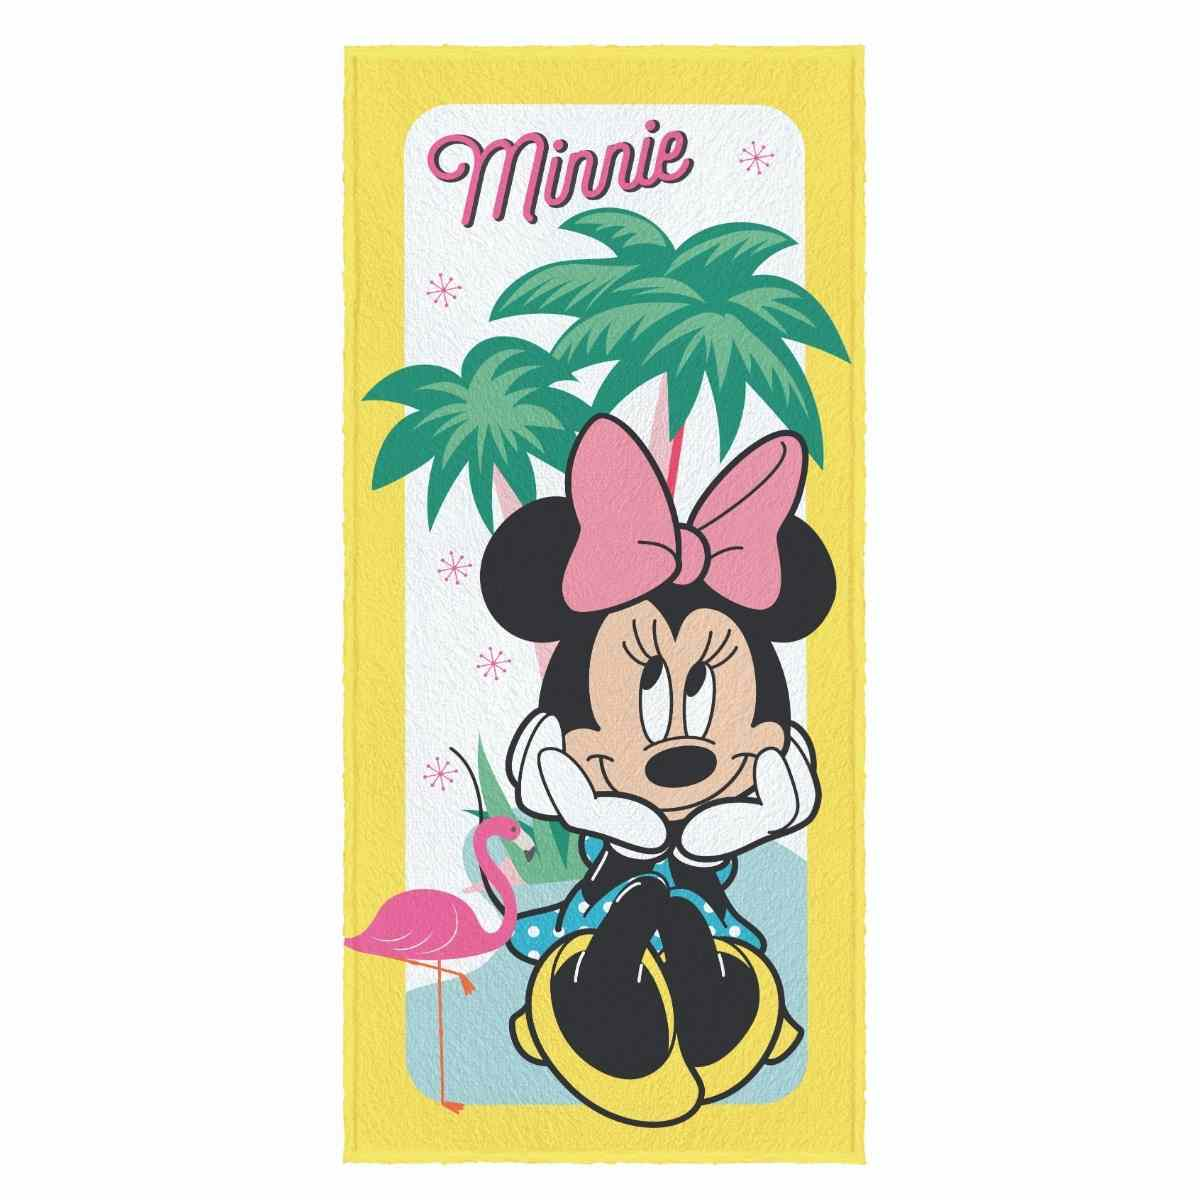 Toalha banho infantil felpuda 60x120 Minnie Est 1